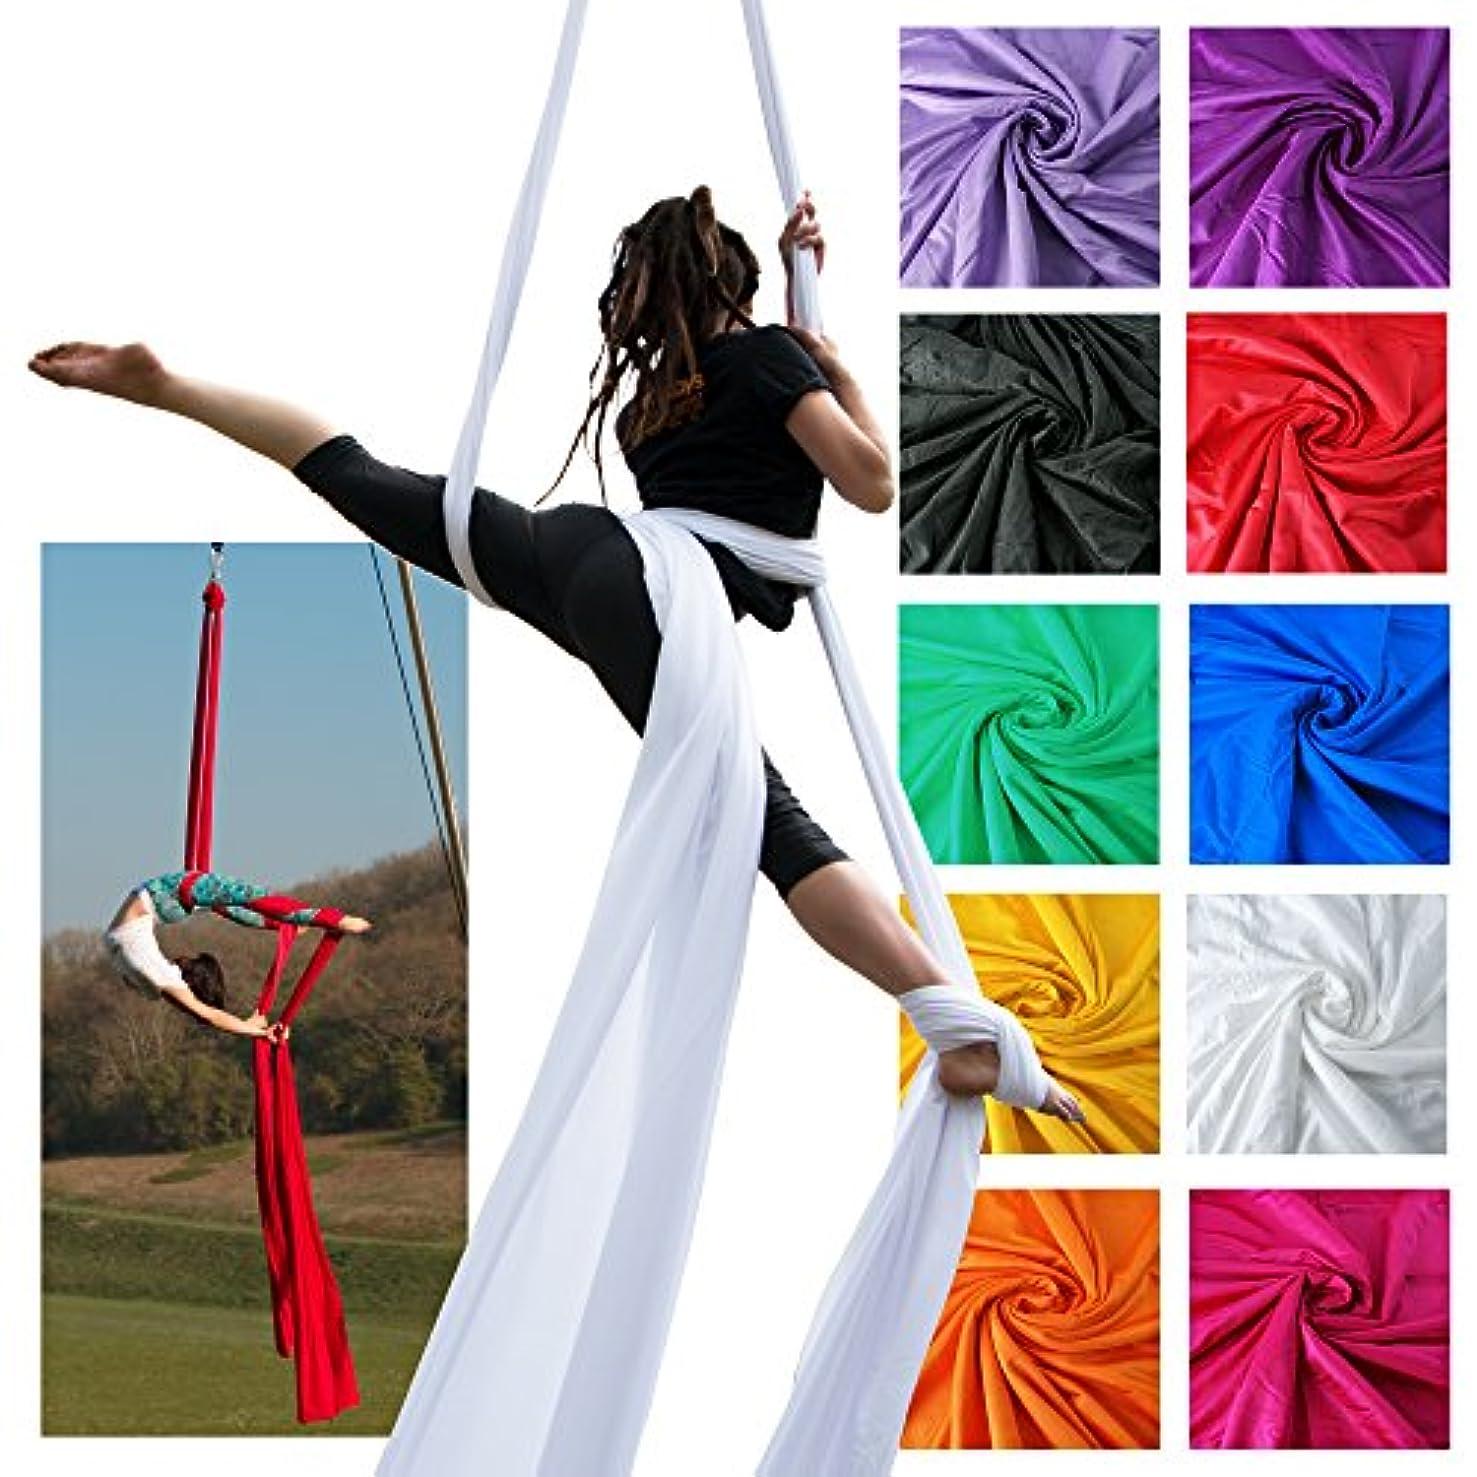 Firetoys Professional Aerial Silks Fabric/Tissues, Medium Stretch Silk WLL 282lbs (128kg)